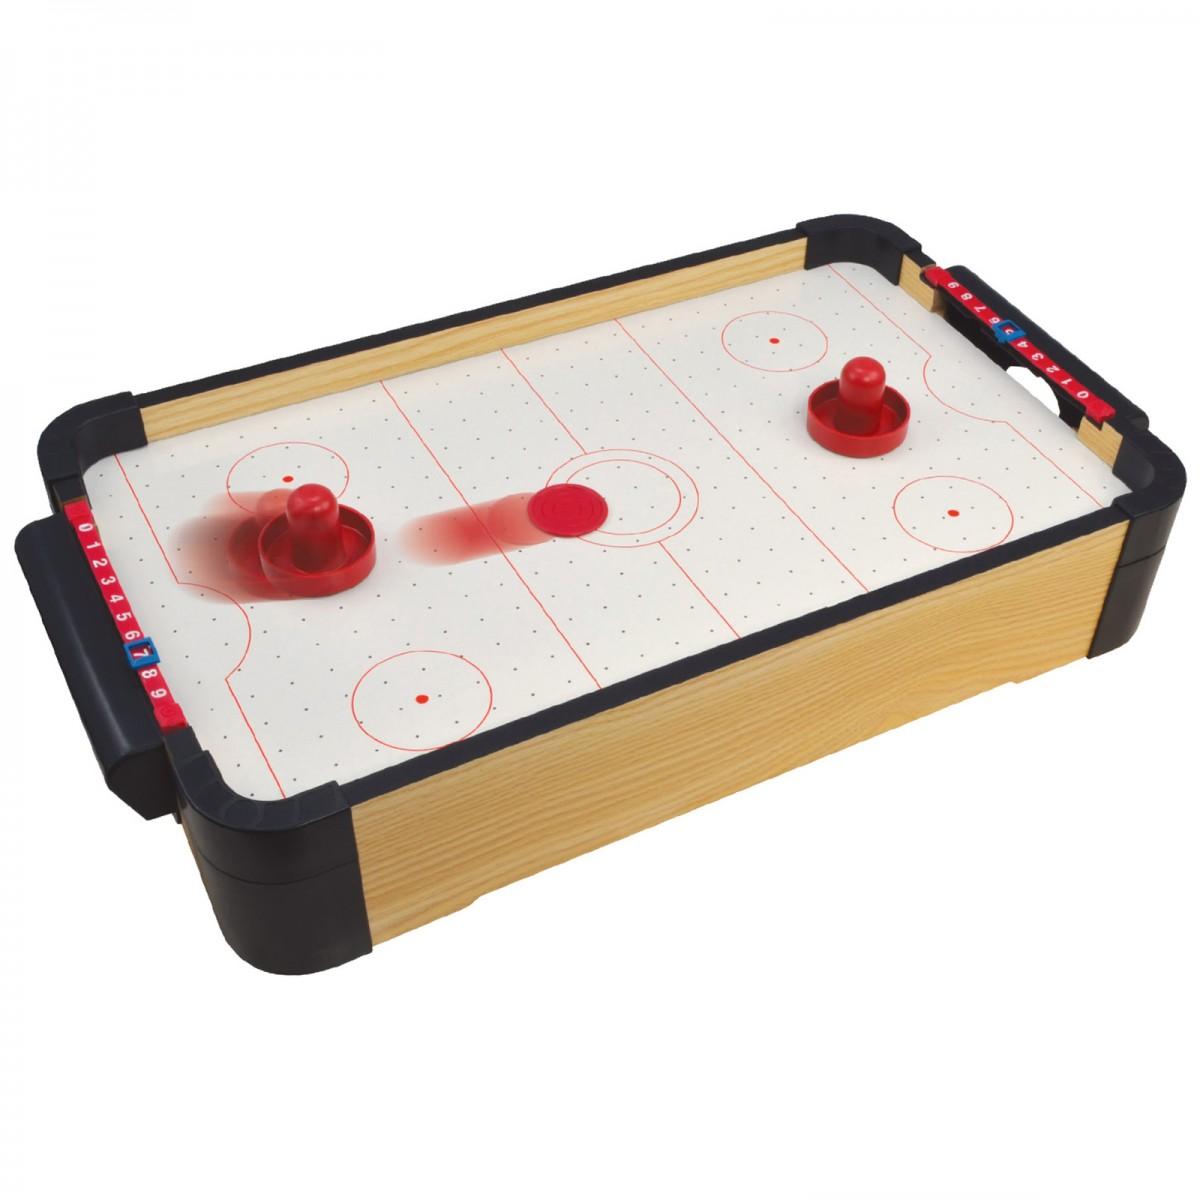 16 40cm Wood Tabletop Air Hockey